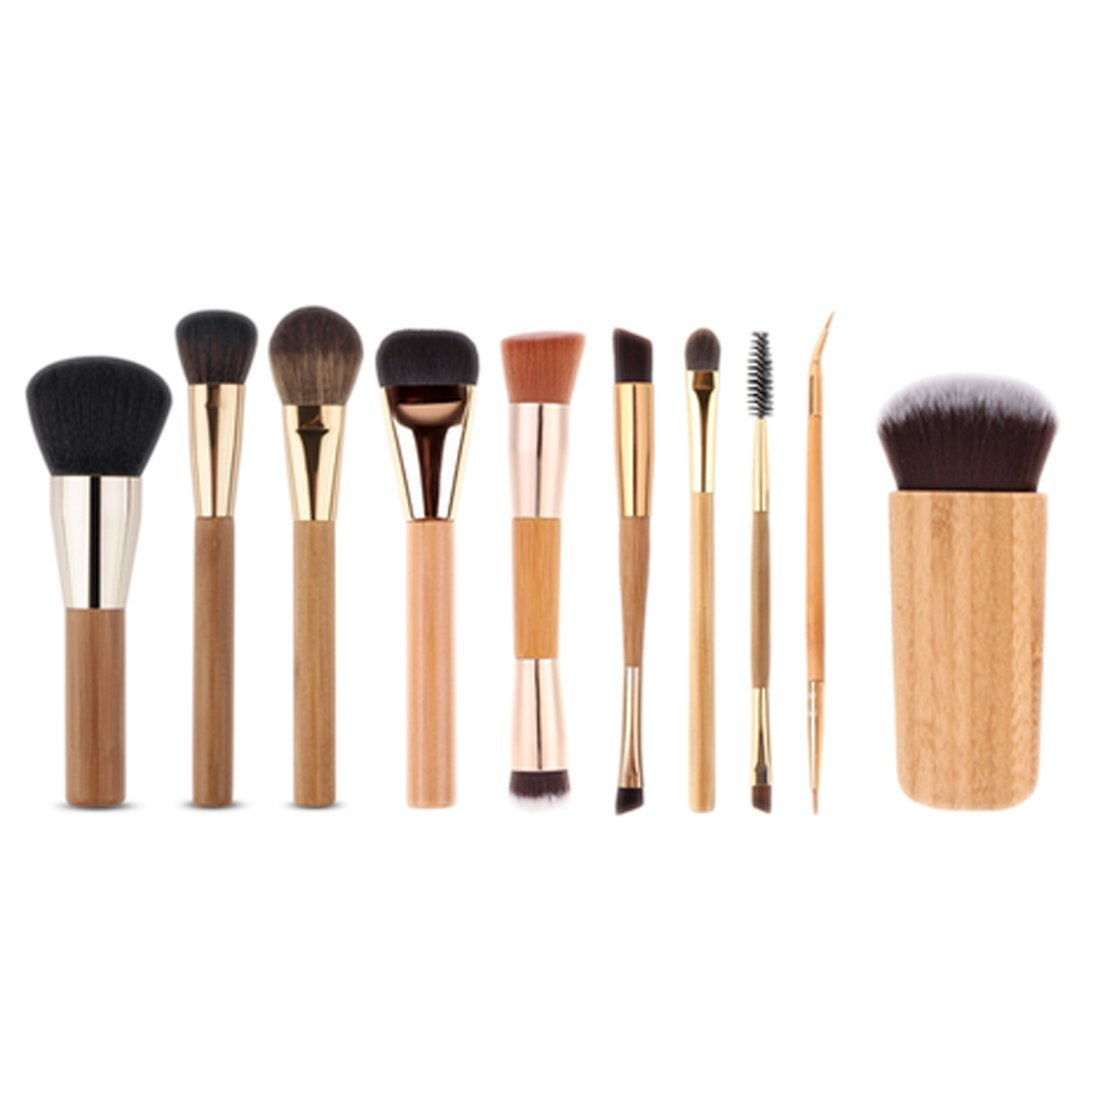 Amazon.com: Professional Makeup Brush Set | Wooden Handle Cosmetics Foundation | Best Makeup Brush Set Collection for Women & Girls: Beauty